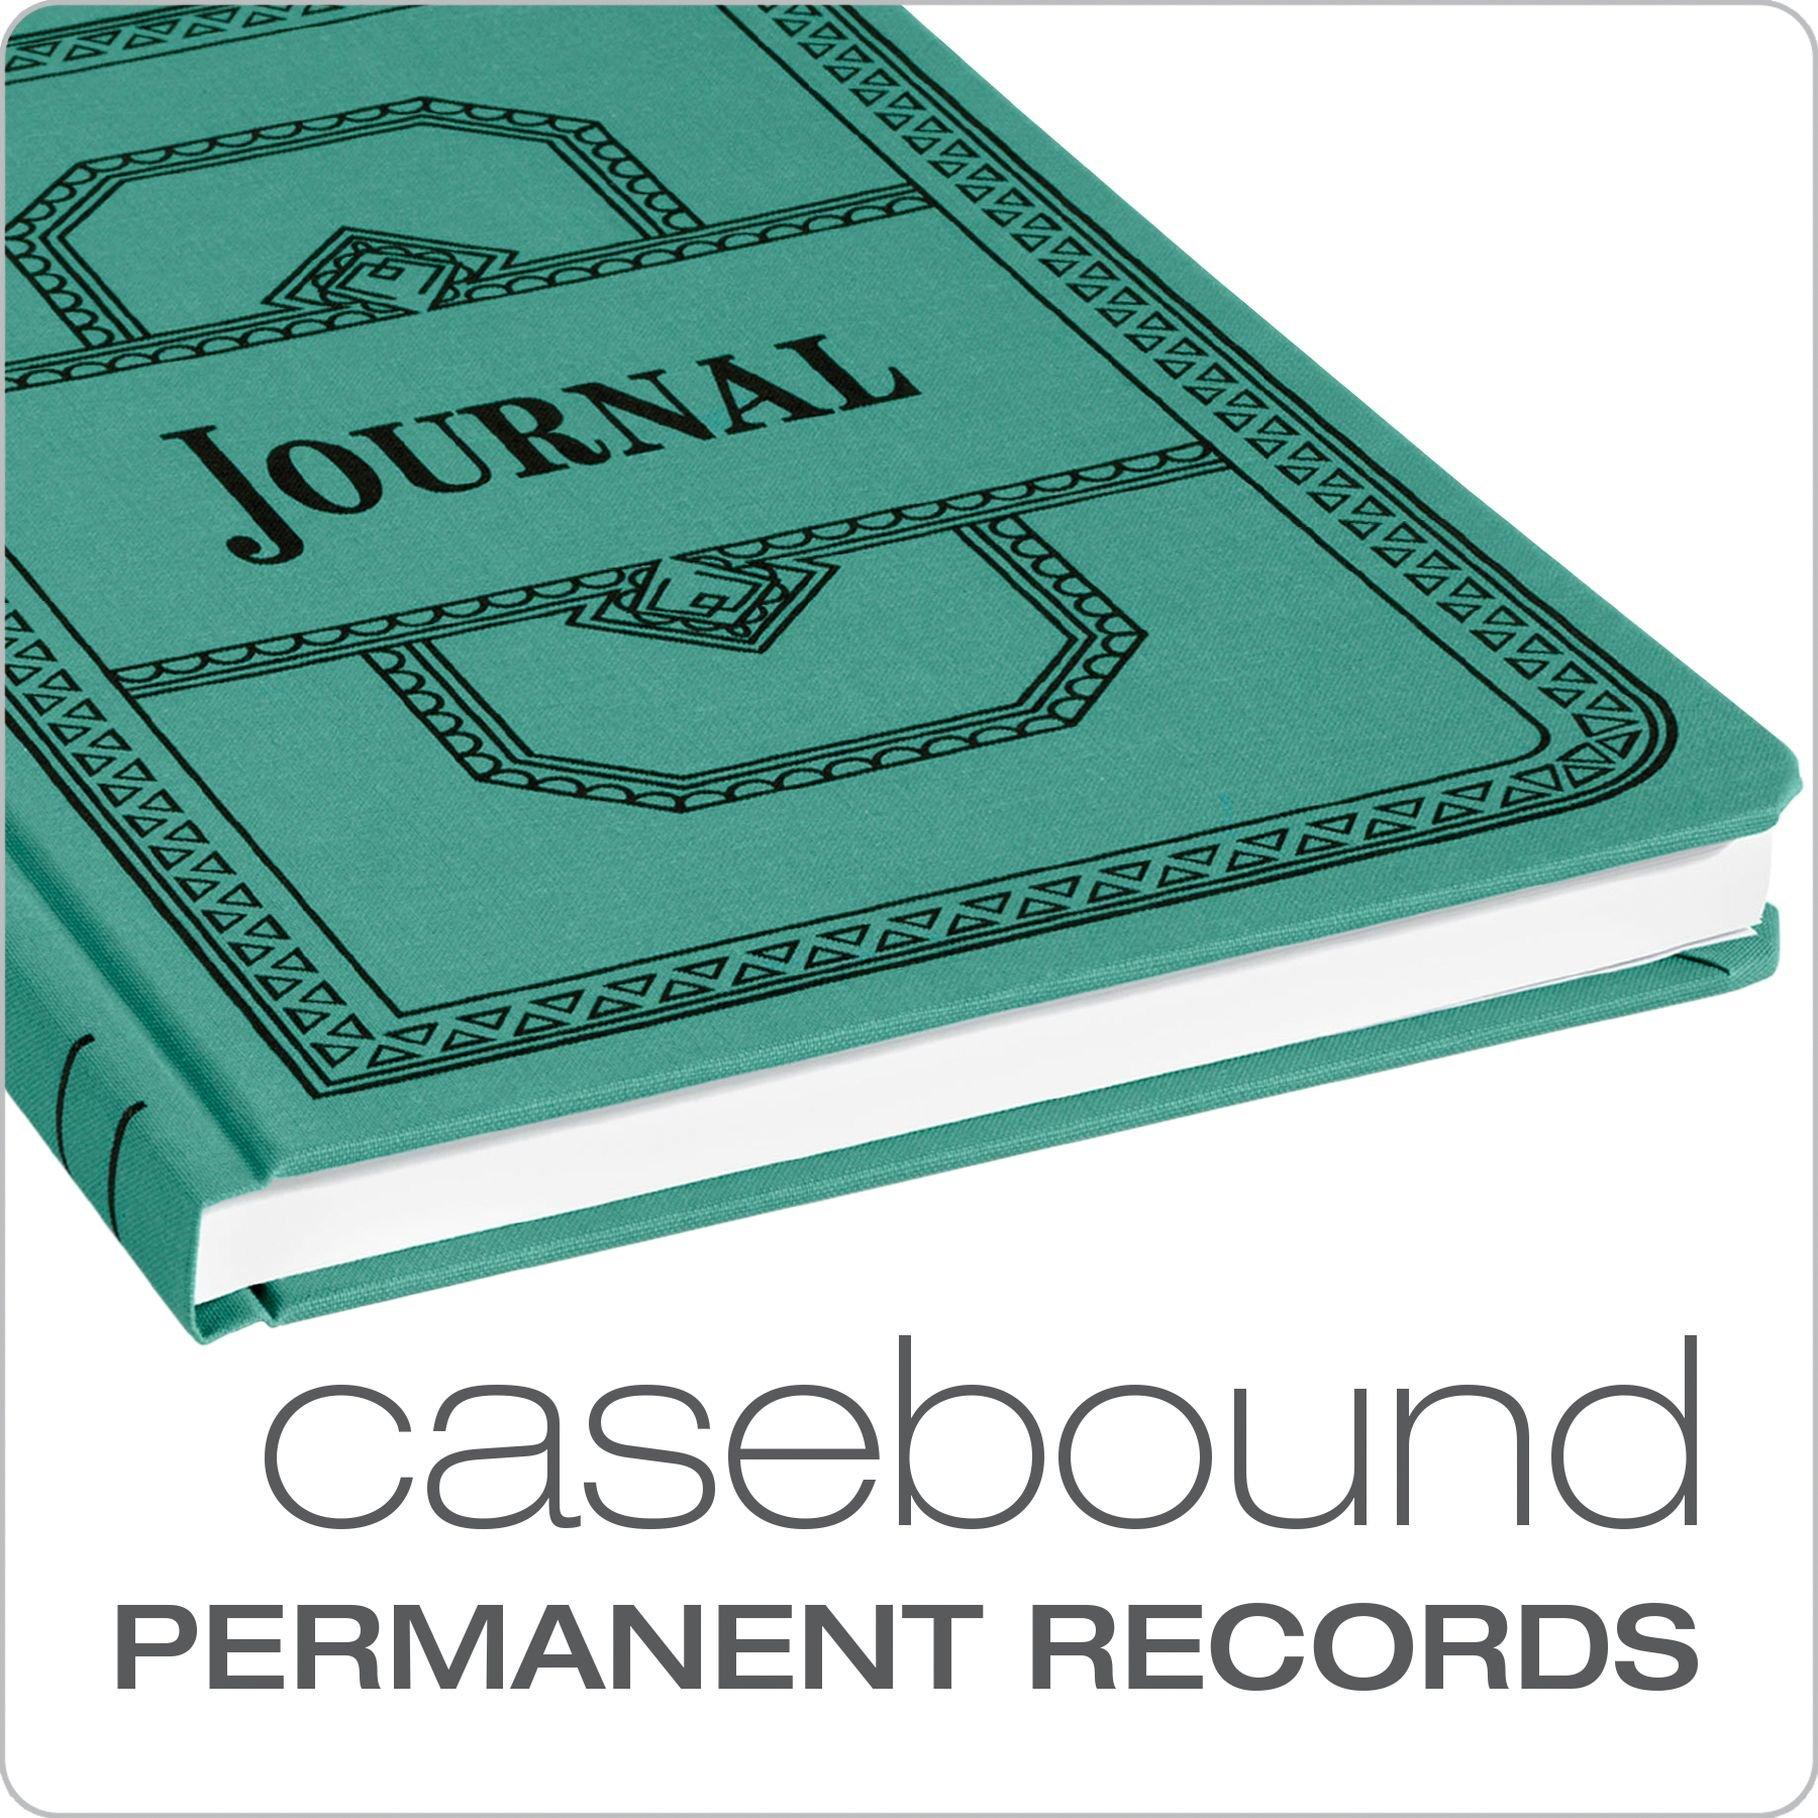 Boorum & Pease 66 Series Account Book, Journal Ruled, Green, 500 Pages, 12-1/8'' x 7-5/8'' (66-500-J) by Boorum & Pease (Image #2)